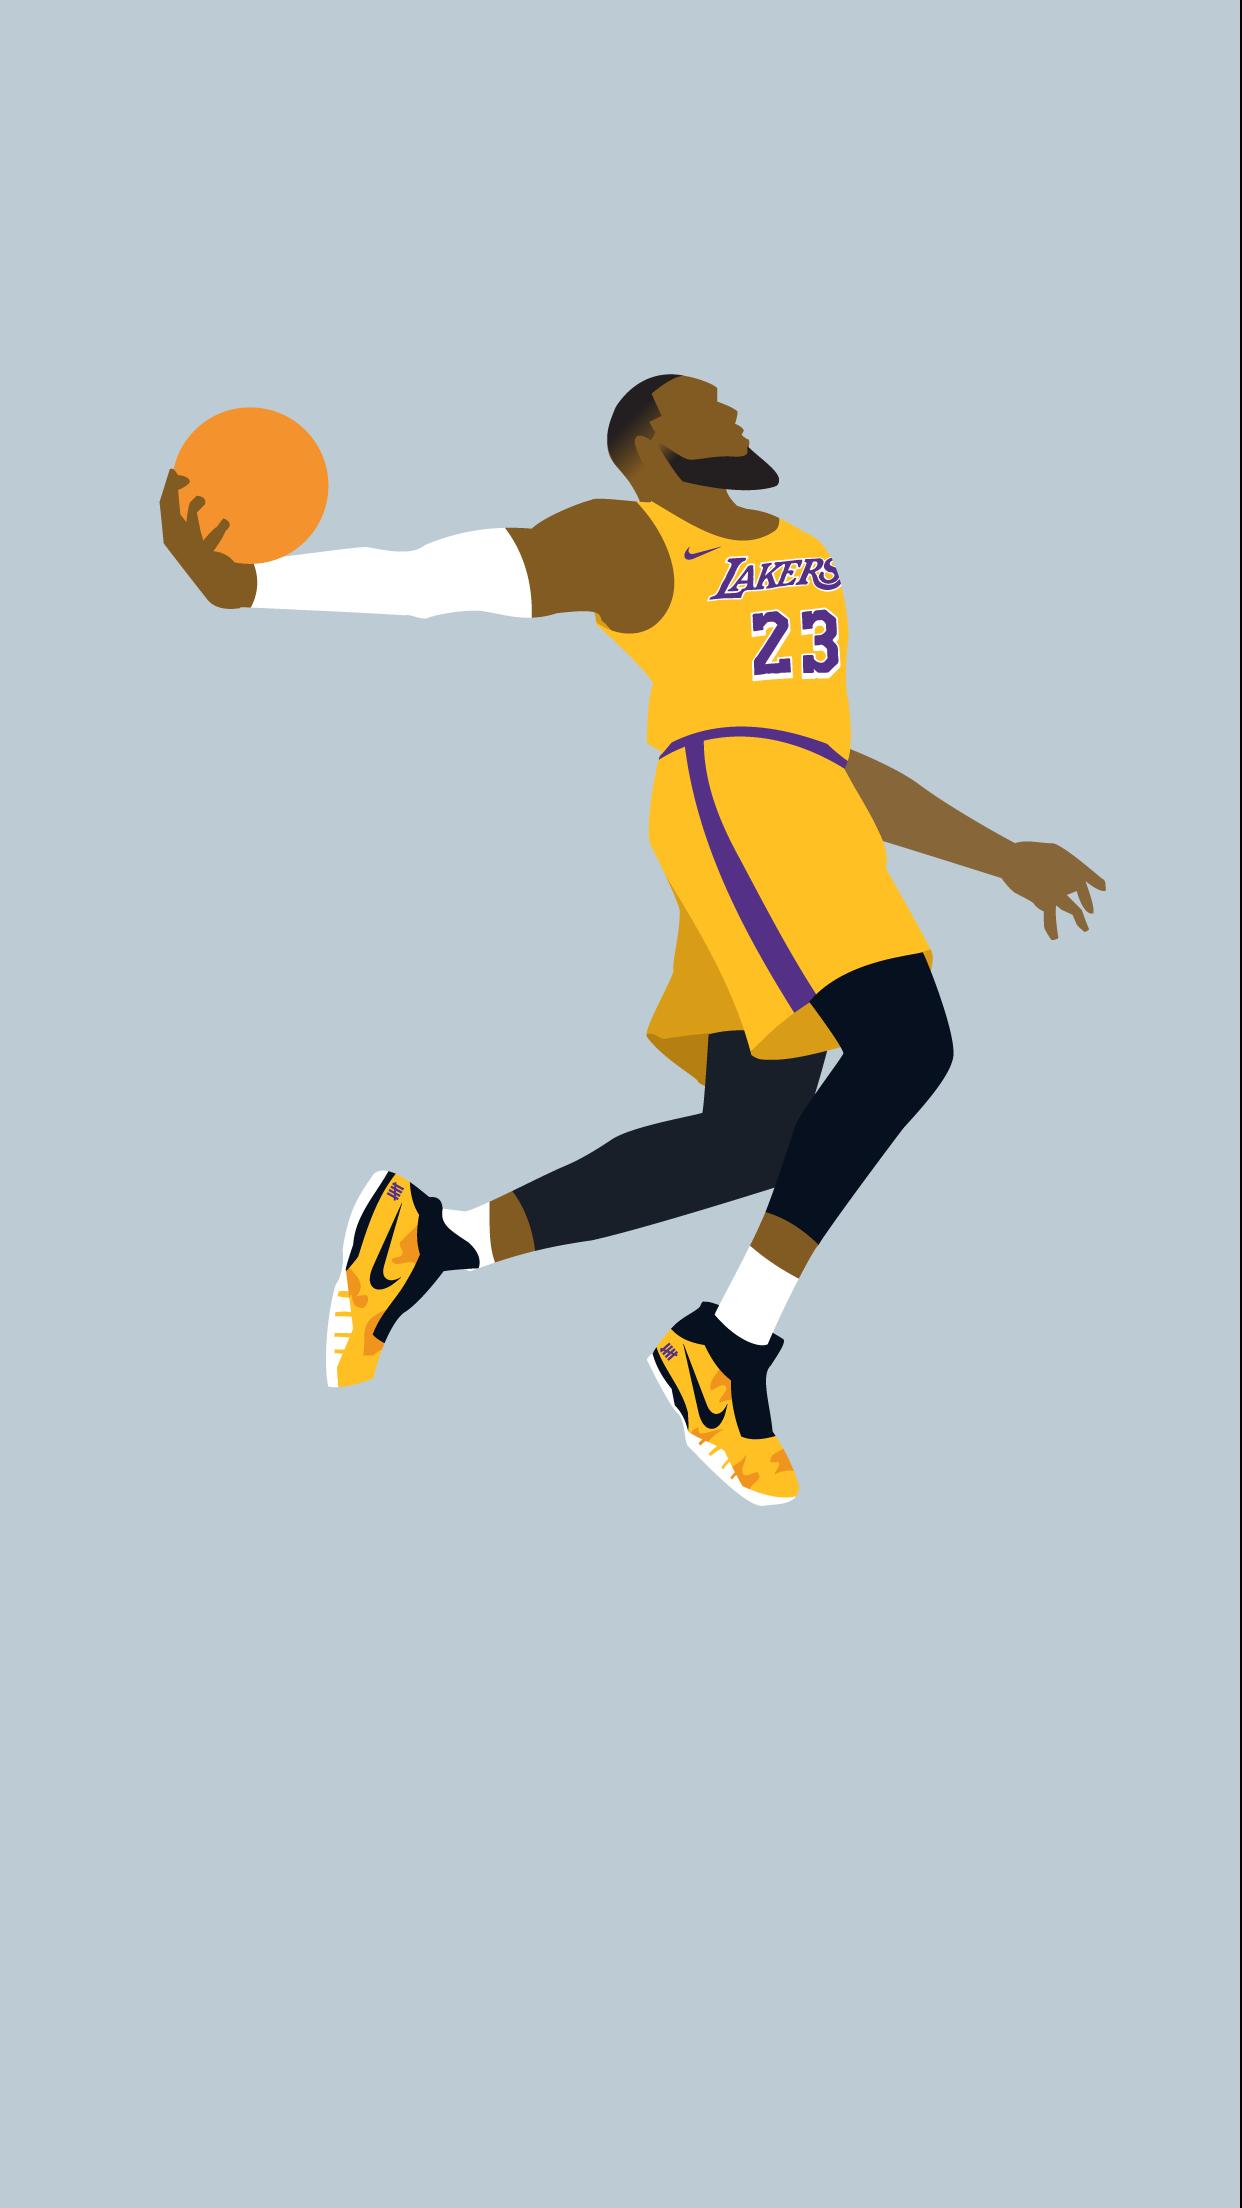 Lebron James Lakers Wallpaper Iphone , HD Wallpaper & Backgrounds